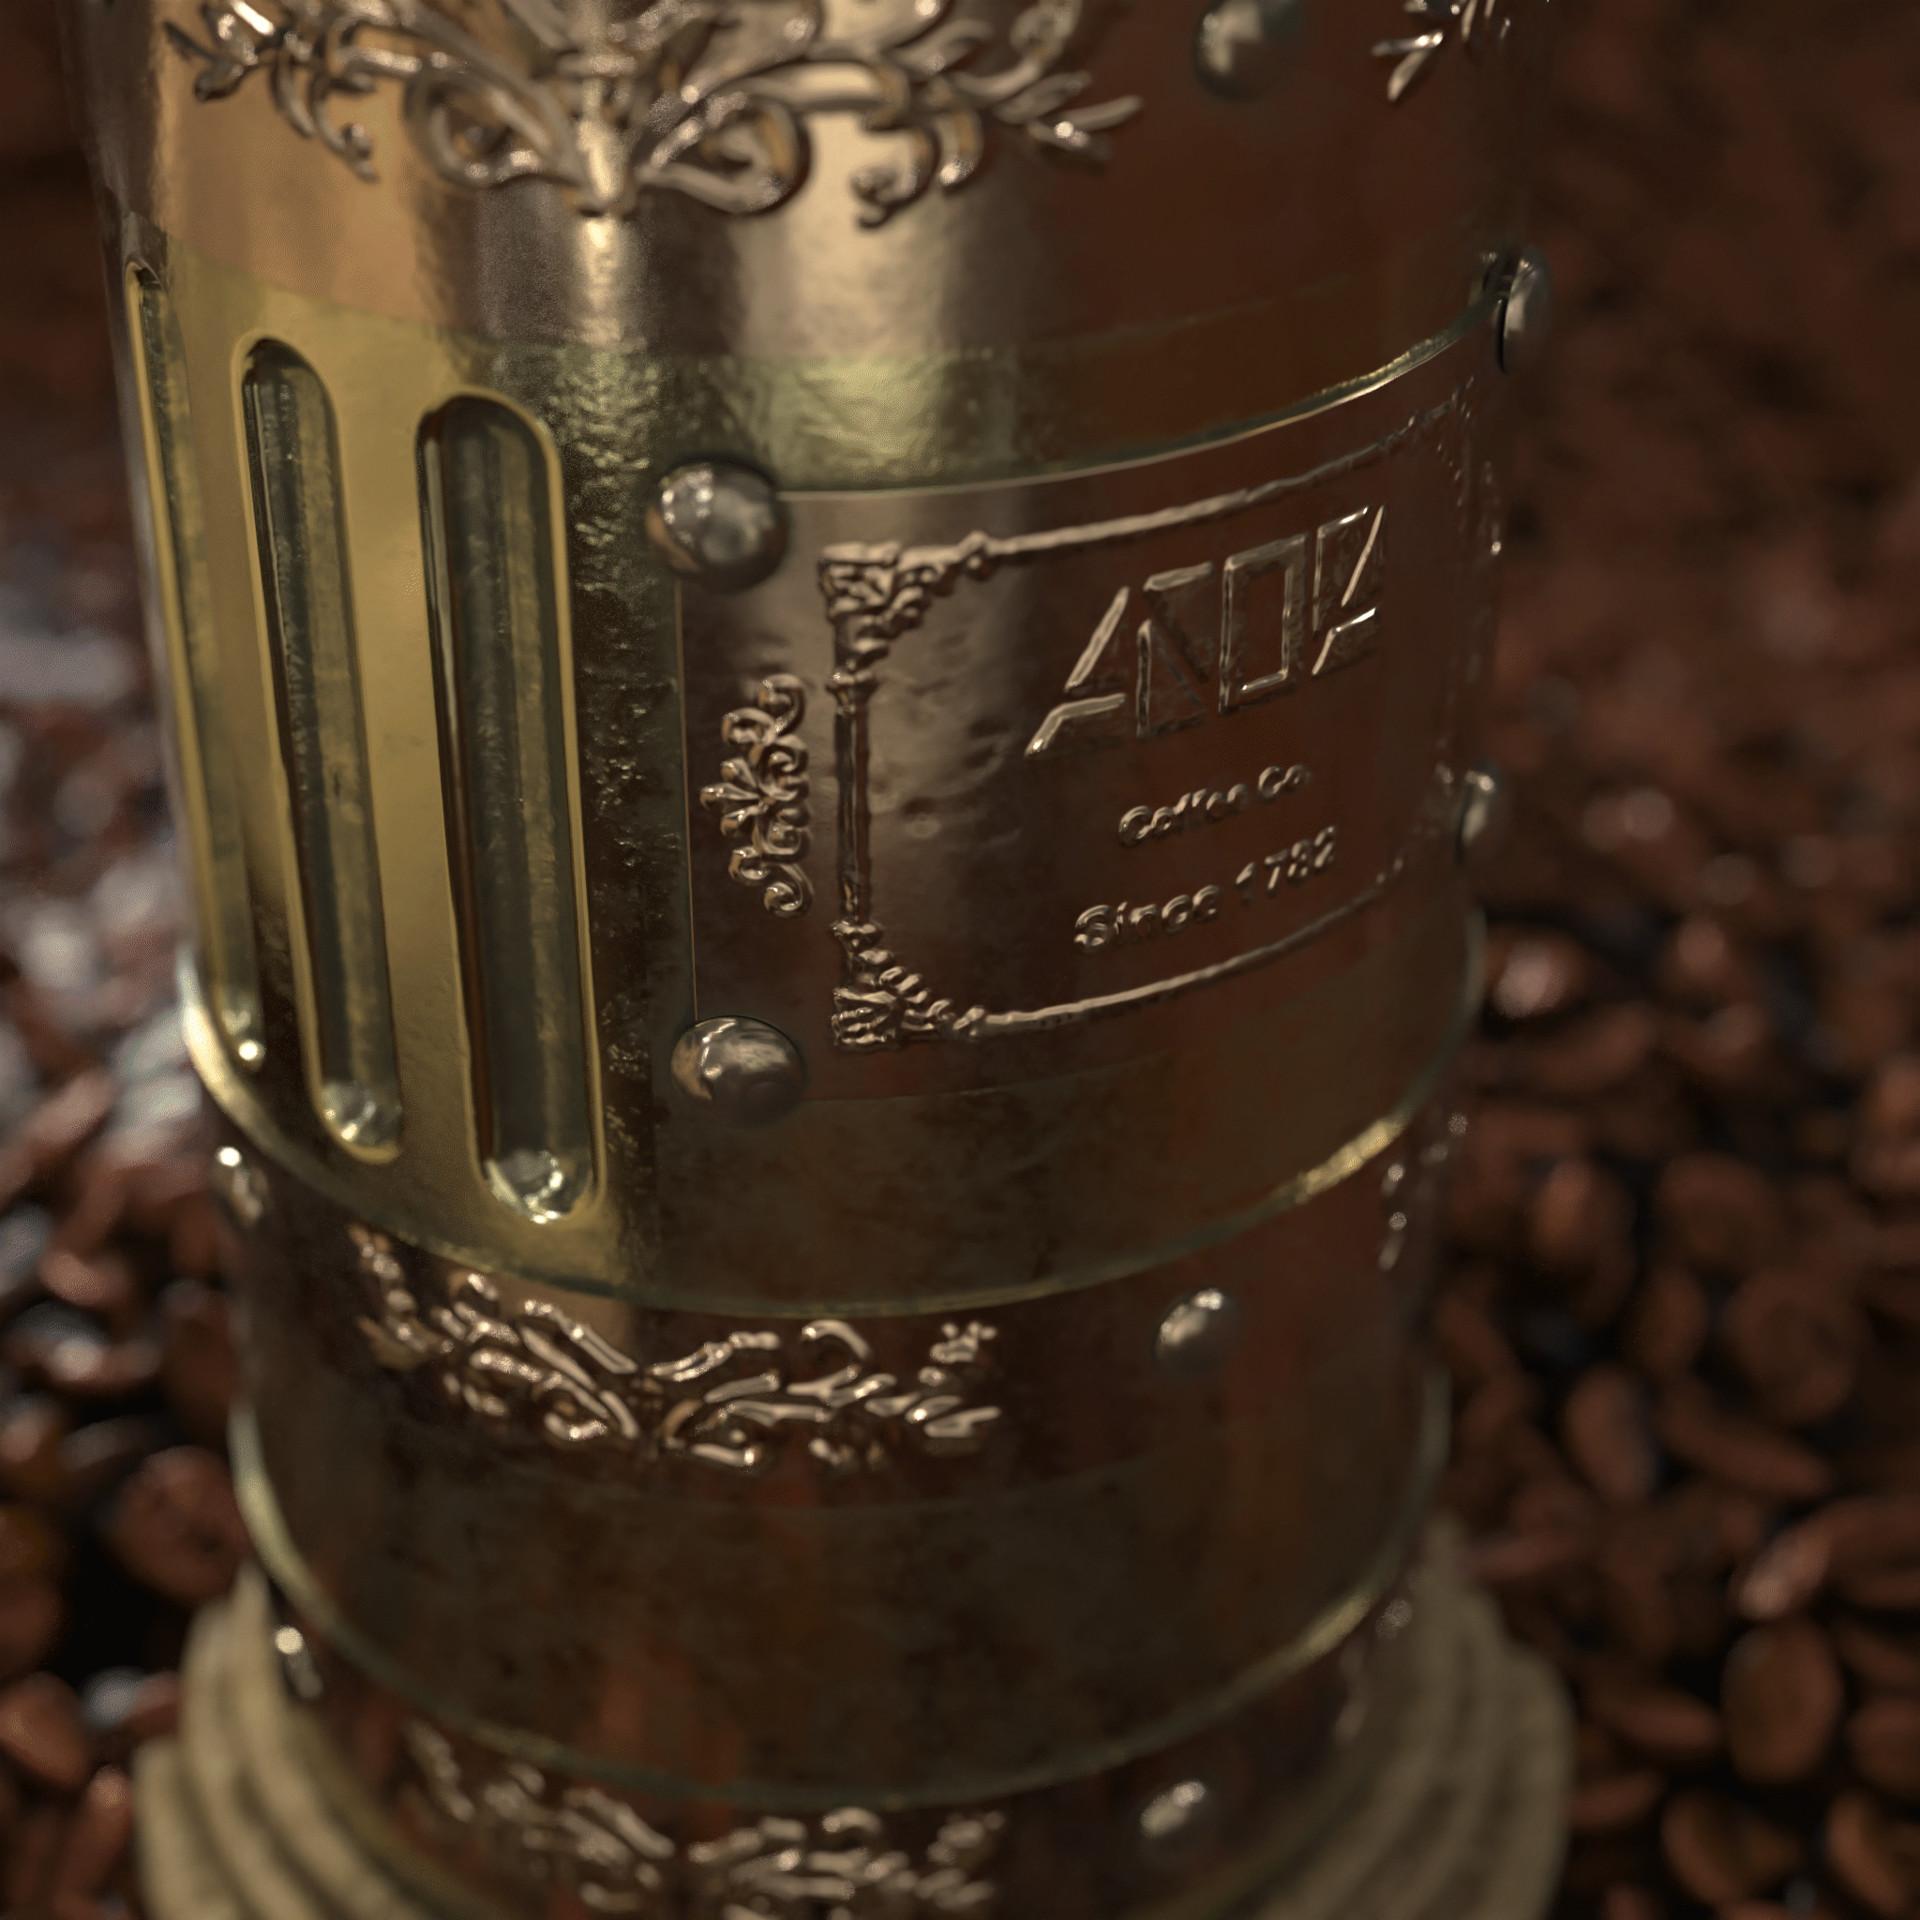 Cem tezcan anova coffee 00004